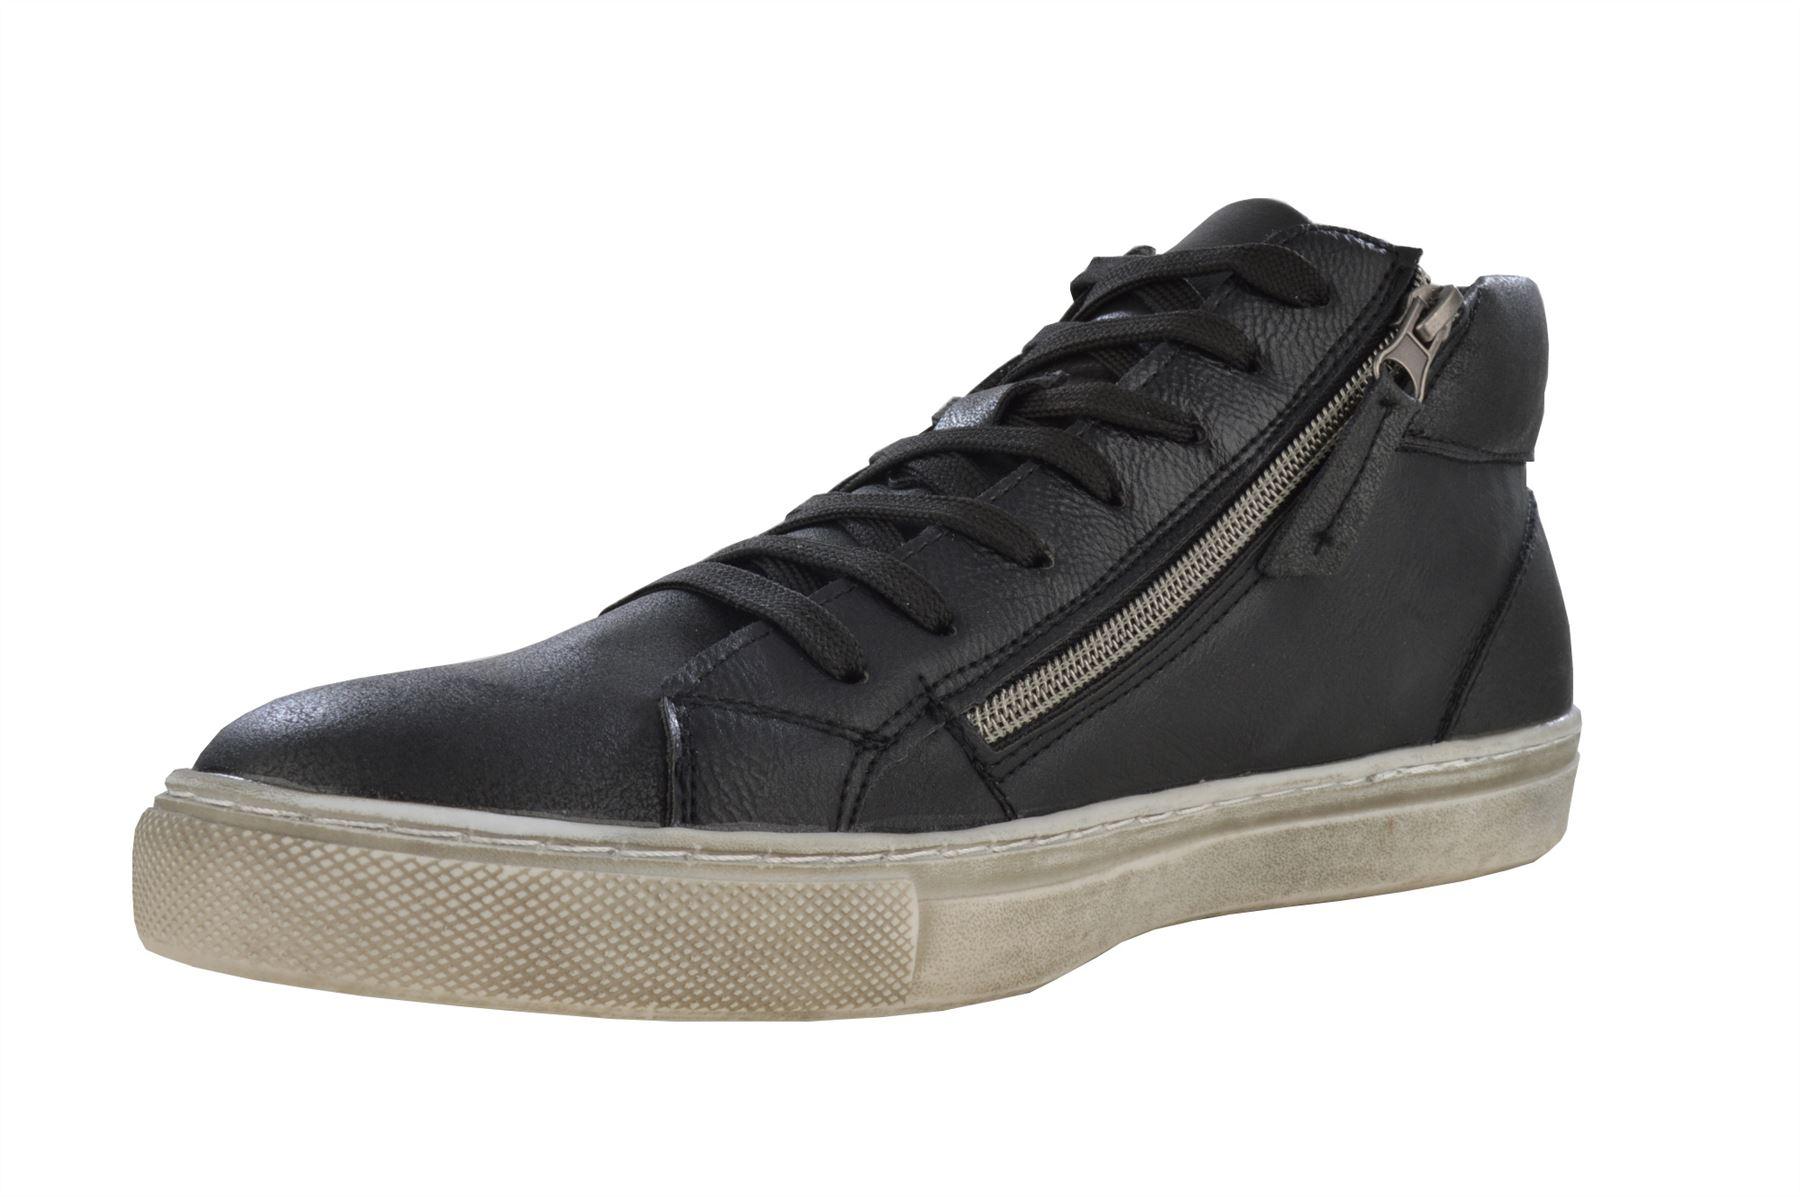 Men's Fashion Double Zip Detail Lace Up Distressed Hi Top Trainer Boot Shoe